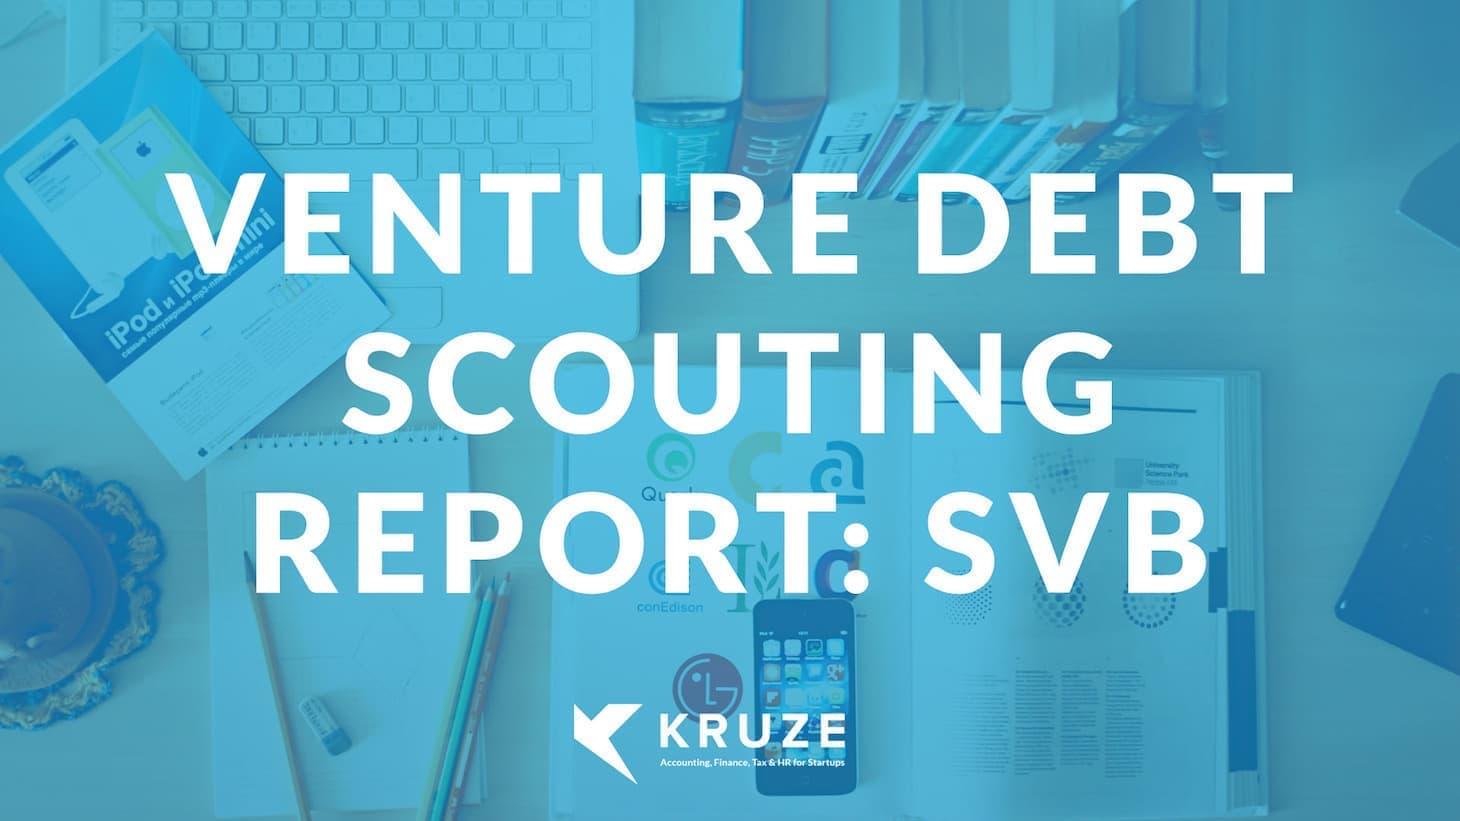 Venture Debt Scouting Report: SVB